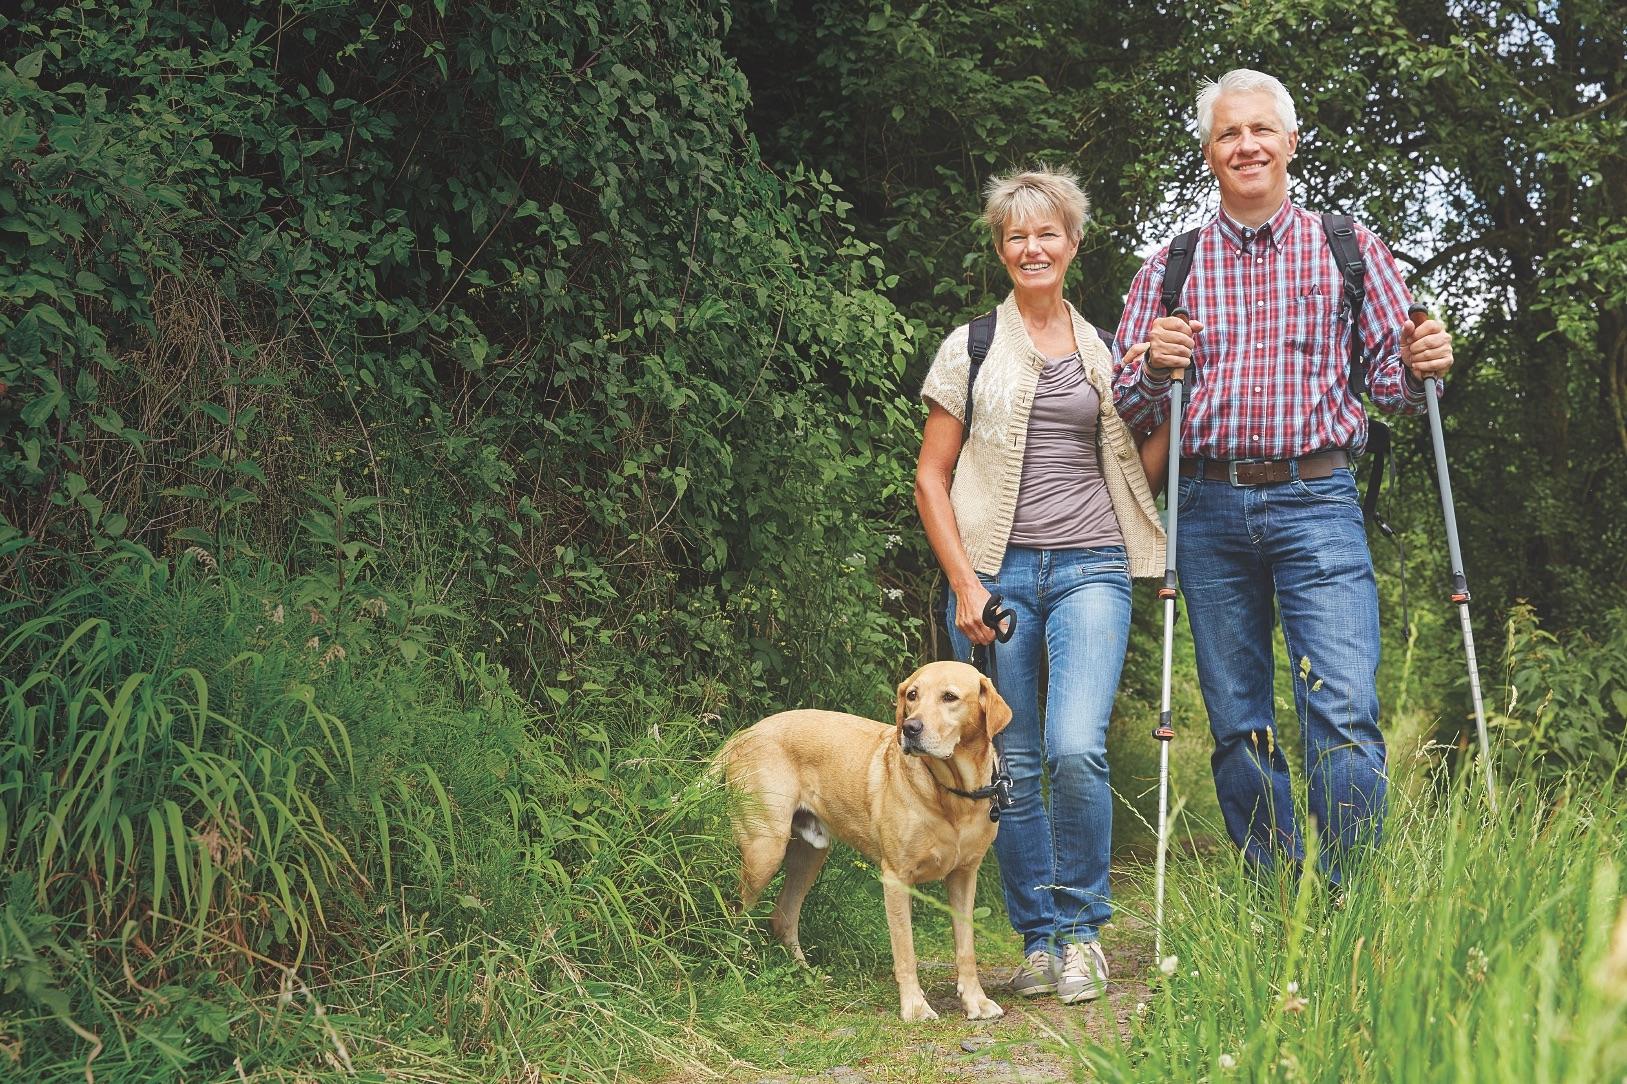 hiking-couple-with-dog-AdobeStoc